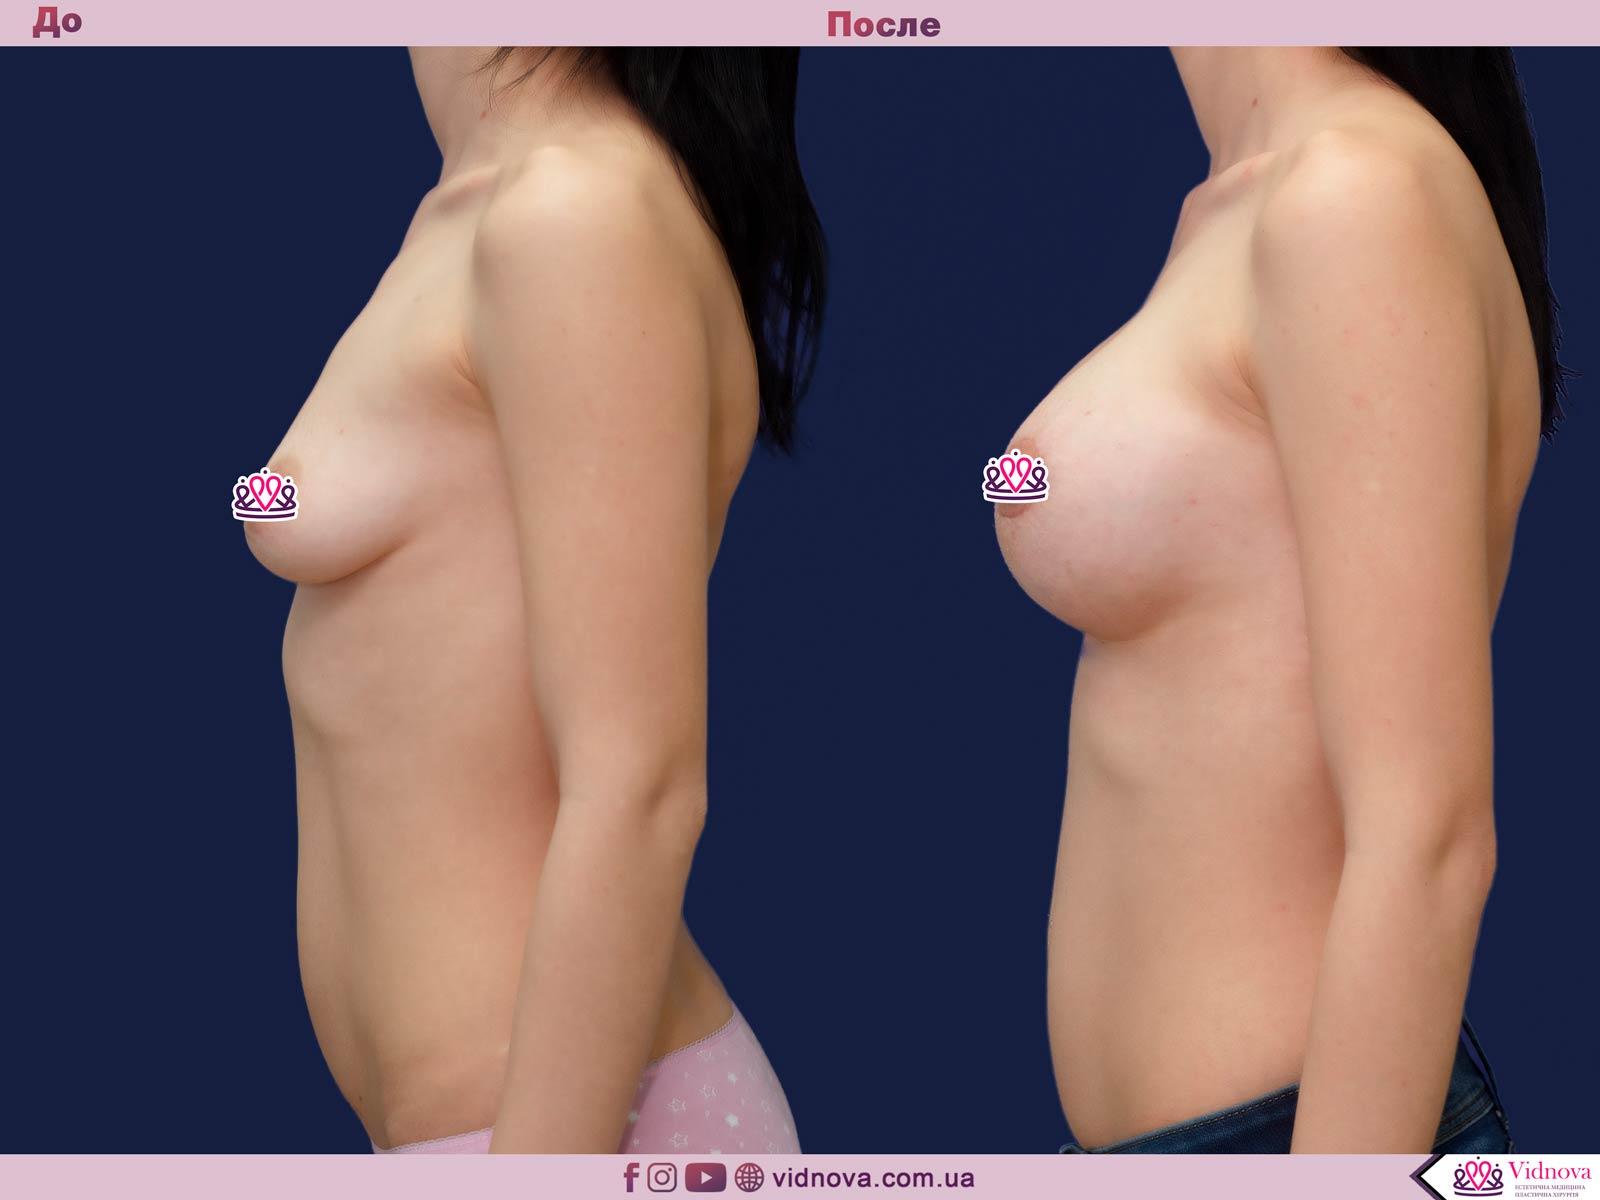 Подтяжка груди: Фото ДО и ПОСЛЕ - Пример №23-3 - Клиника Vidnova